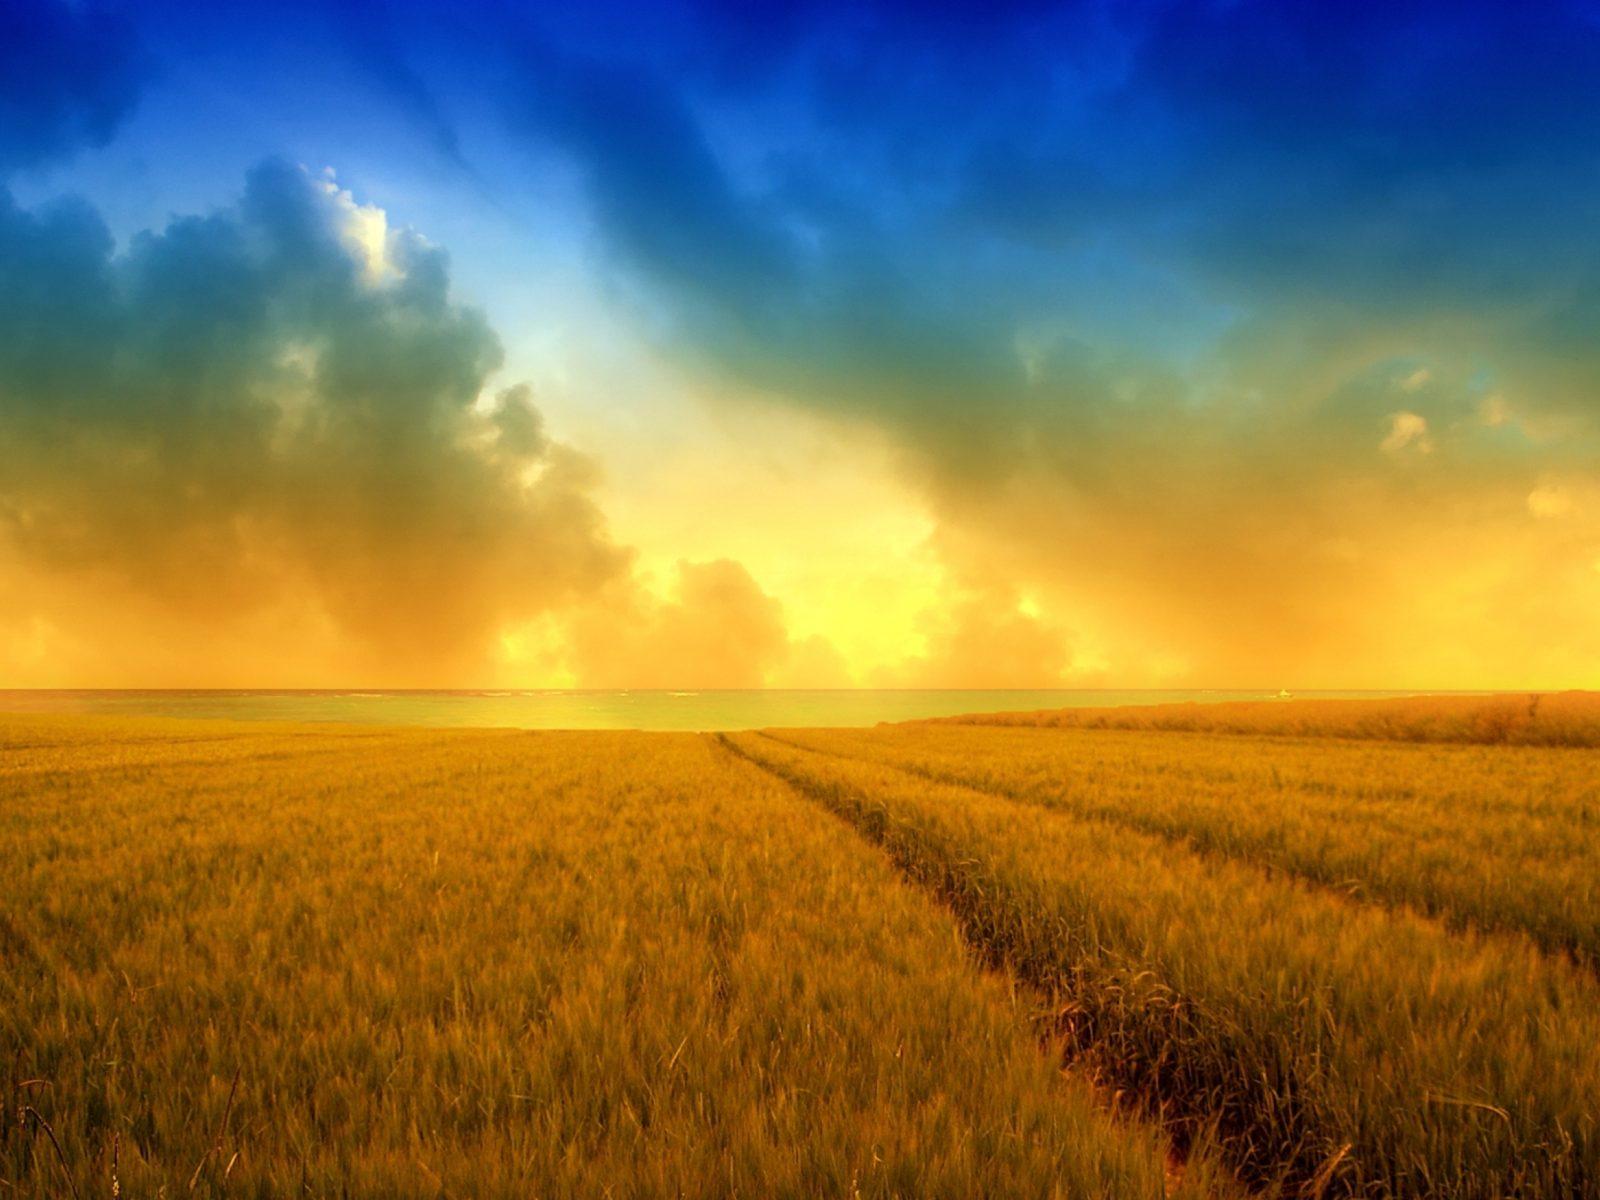 Fall Harvest Wallpaper 1024x768 Hd Wallpapers Golden Harvest Wheat Field 2560x1600